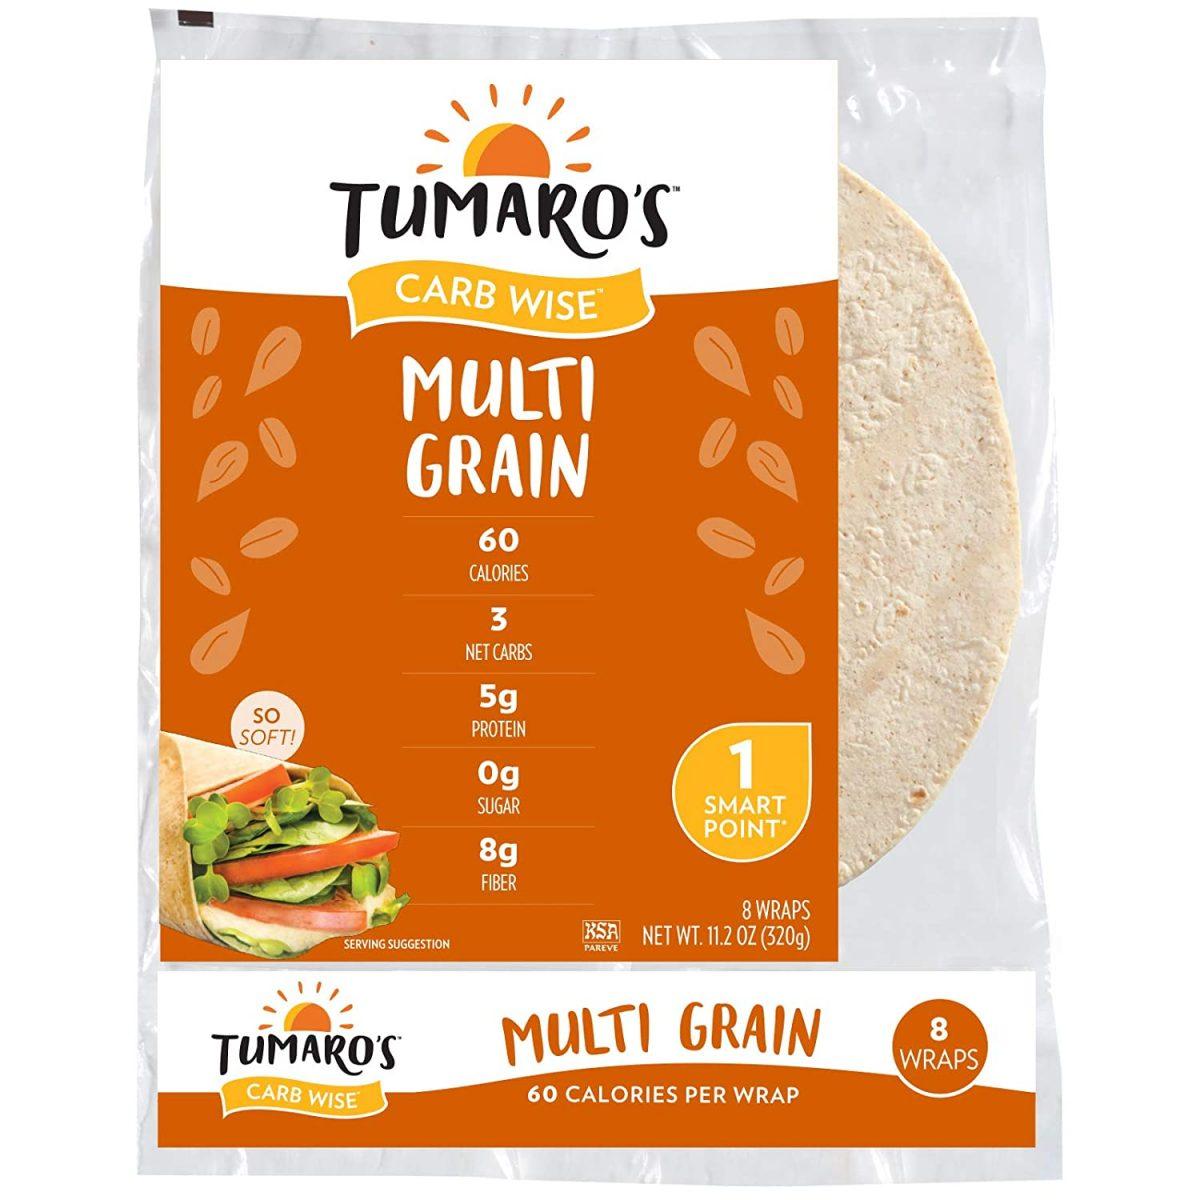 Tumaro's CarbWise Tortillas